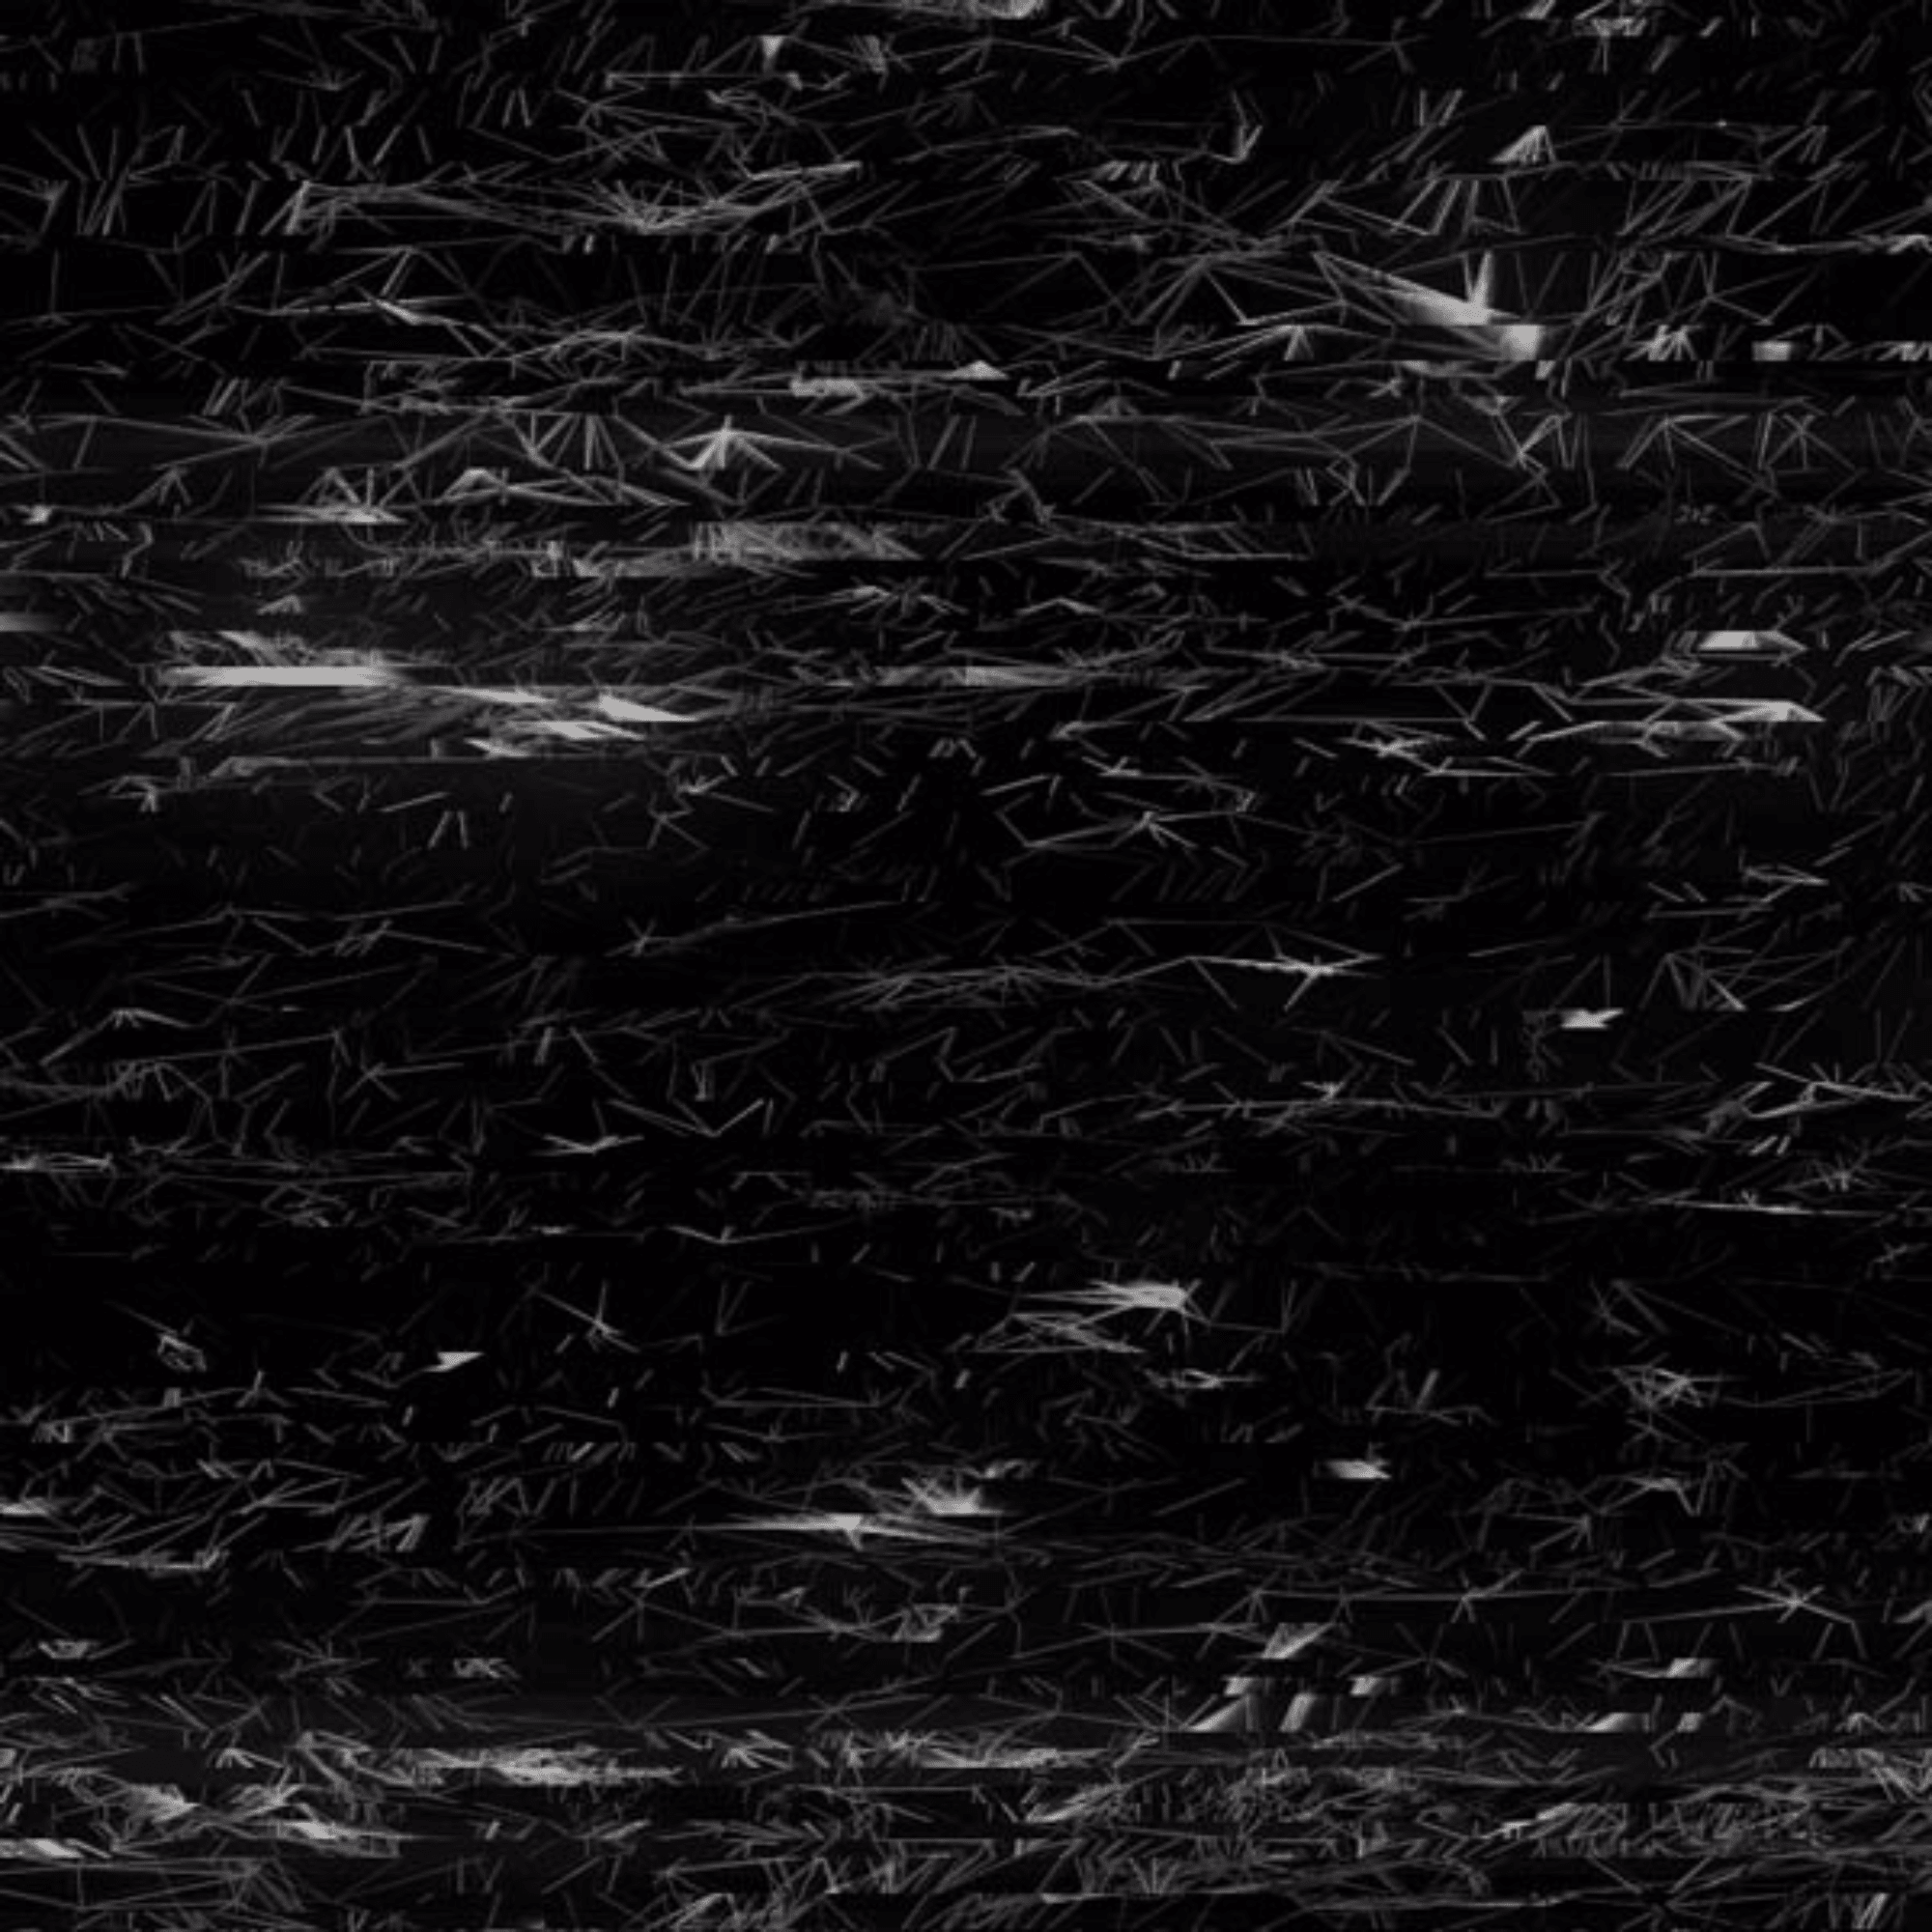 Black,                And,                White,                Monochrome,                Photography,                Darkness,                Phenomenon,                Texture,                Sky,                Computer,                Wallpaper,                 Free Image